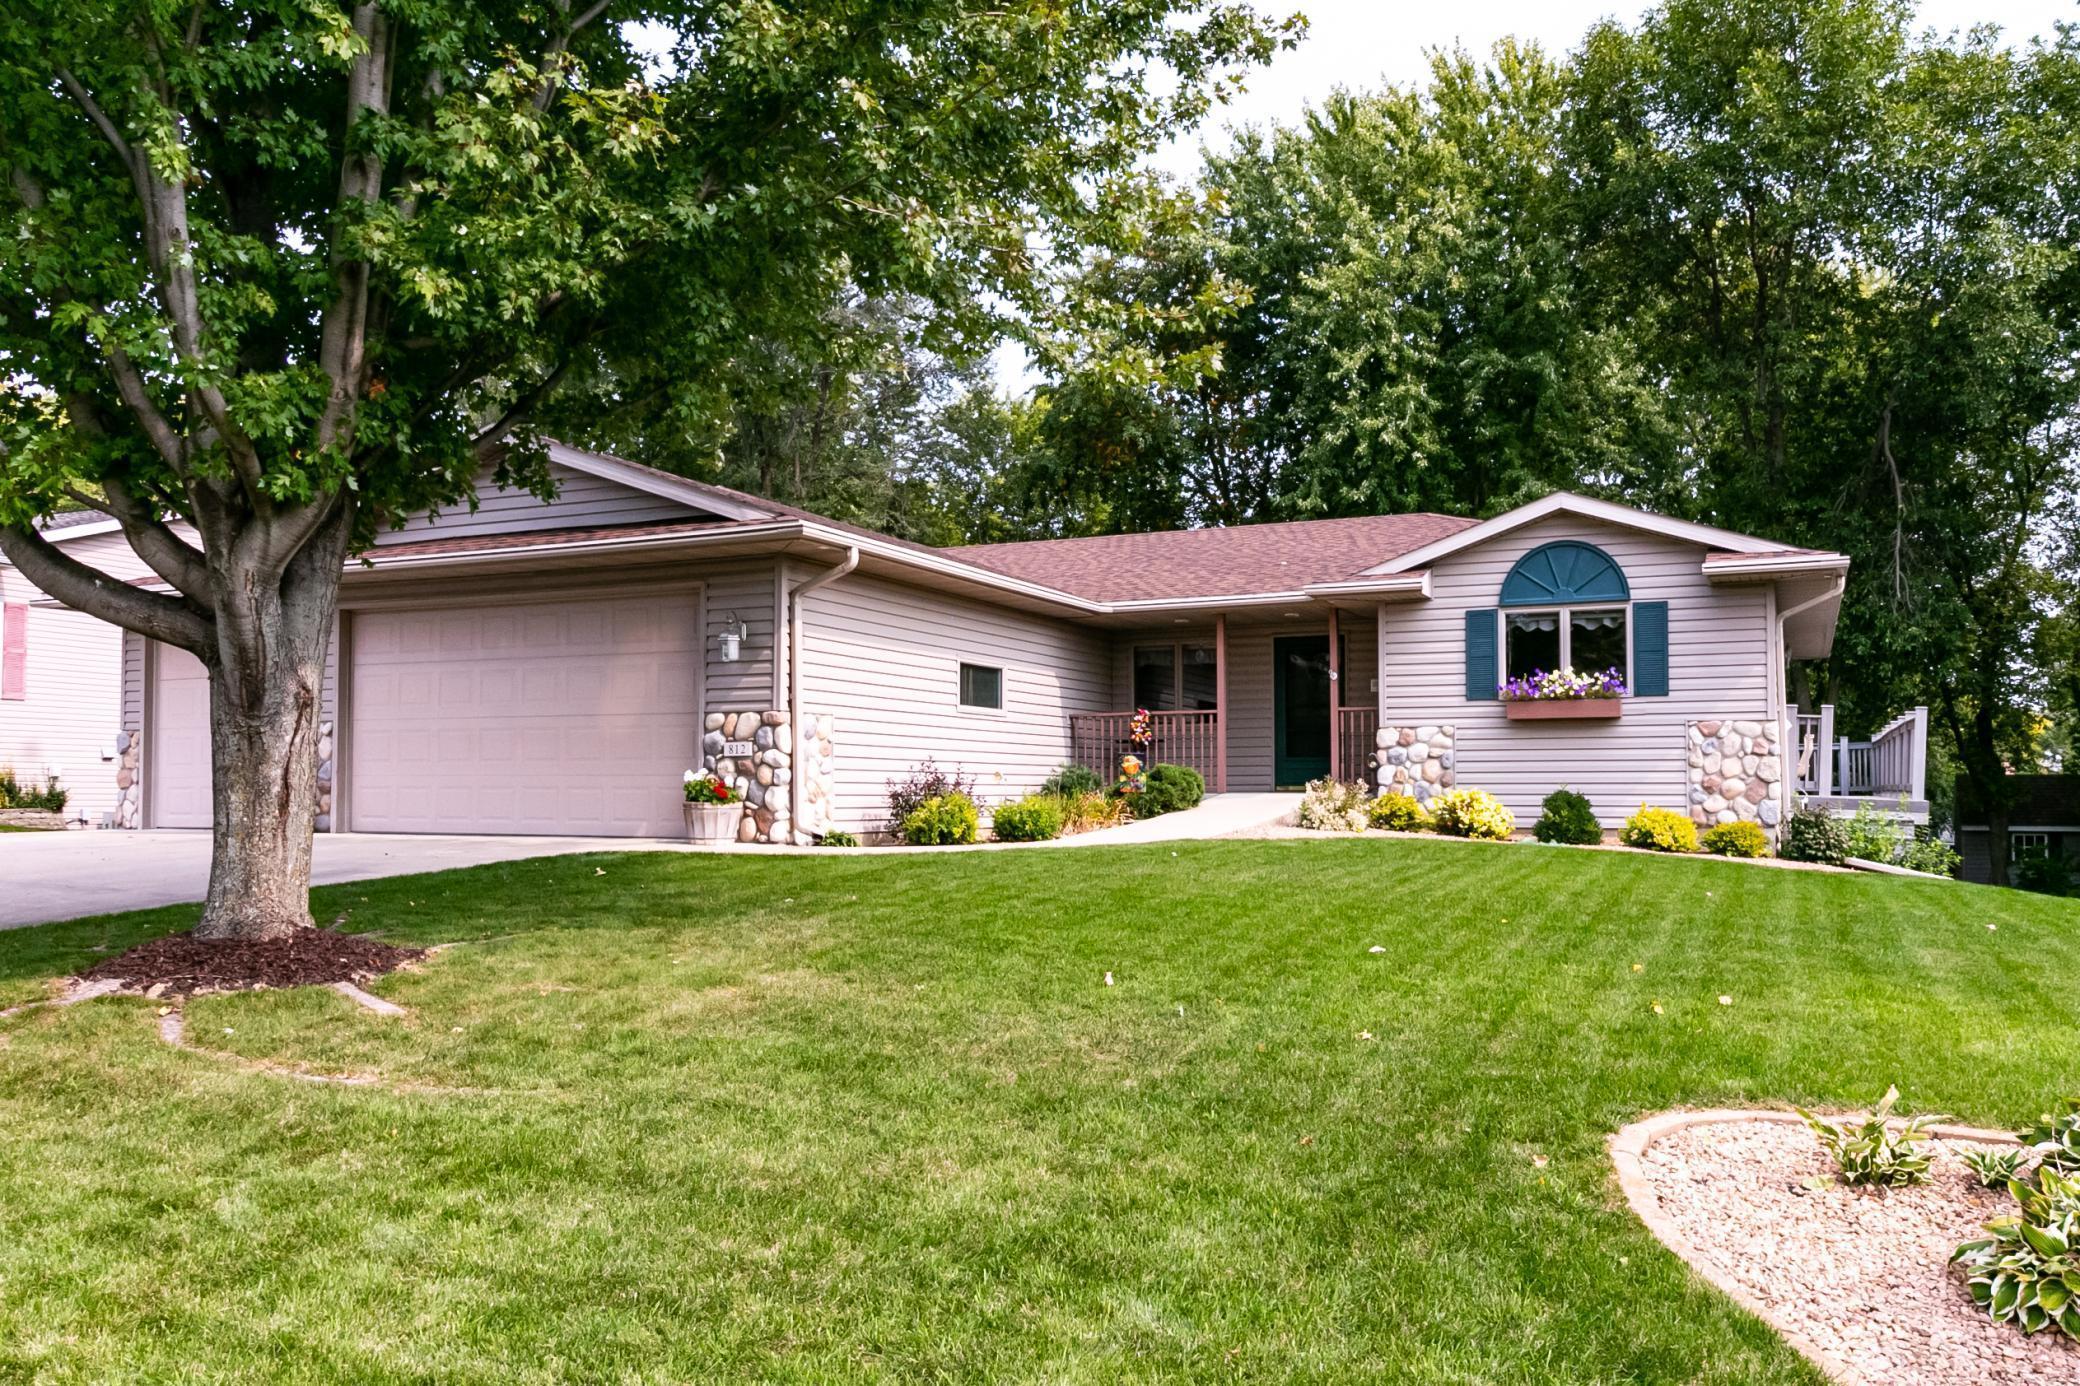 812 Chestnut Street Property Photo - Mantorville, MN real estate listing